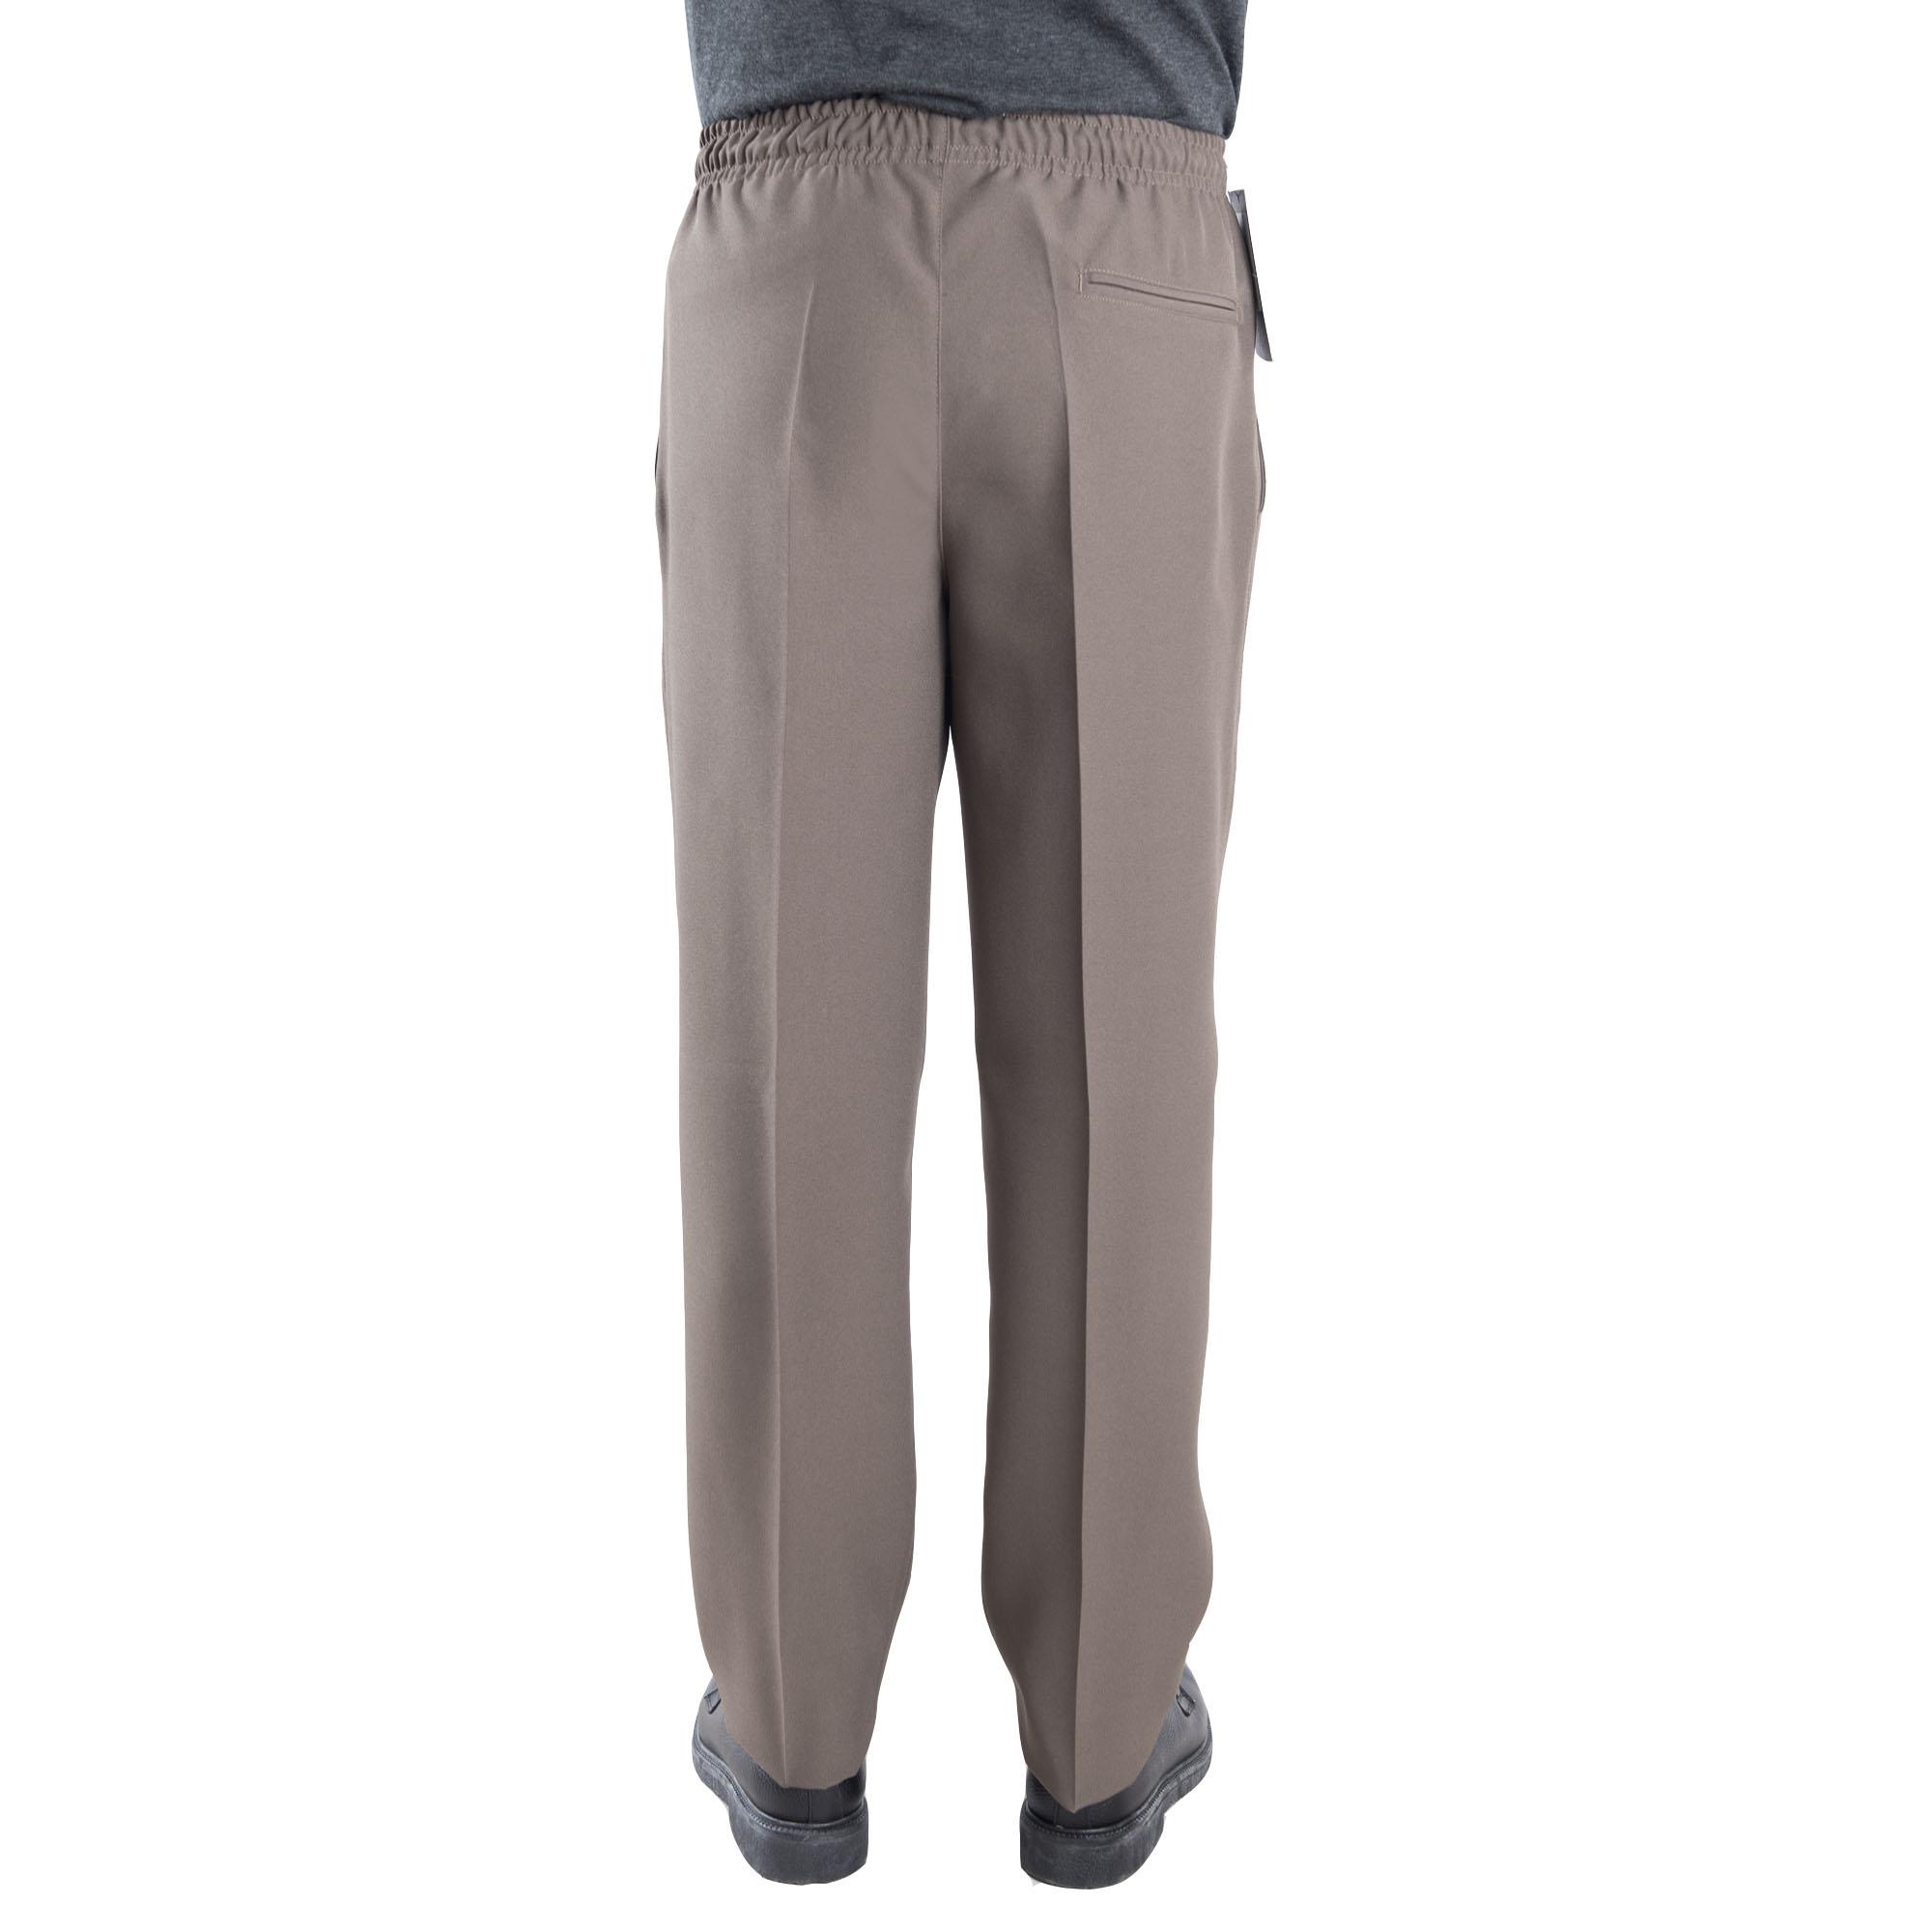 Pantalon Adaptado Elastico Fresco Para Hombre Pantalon Especial Geriatrico